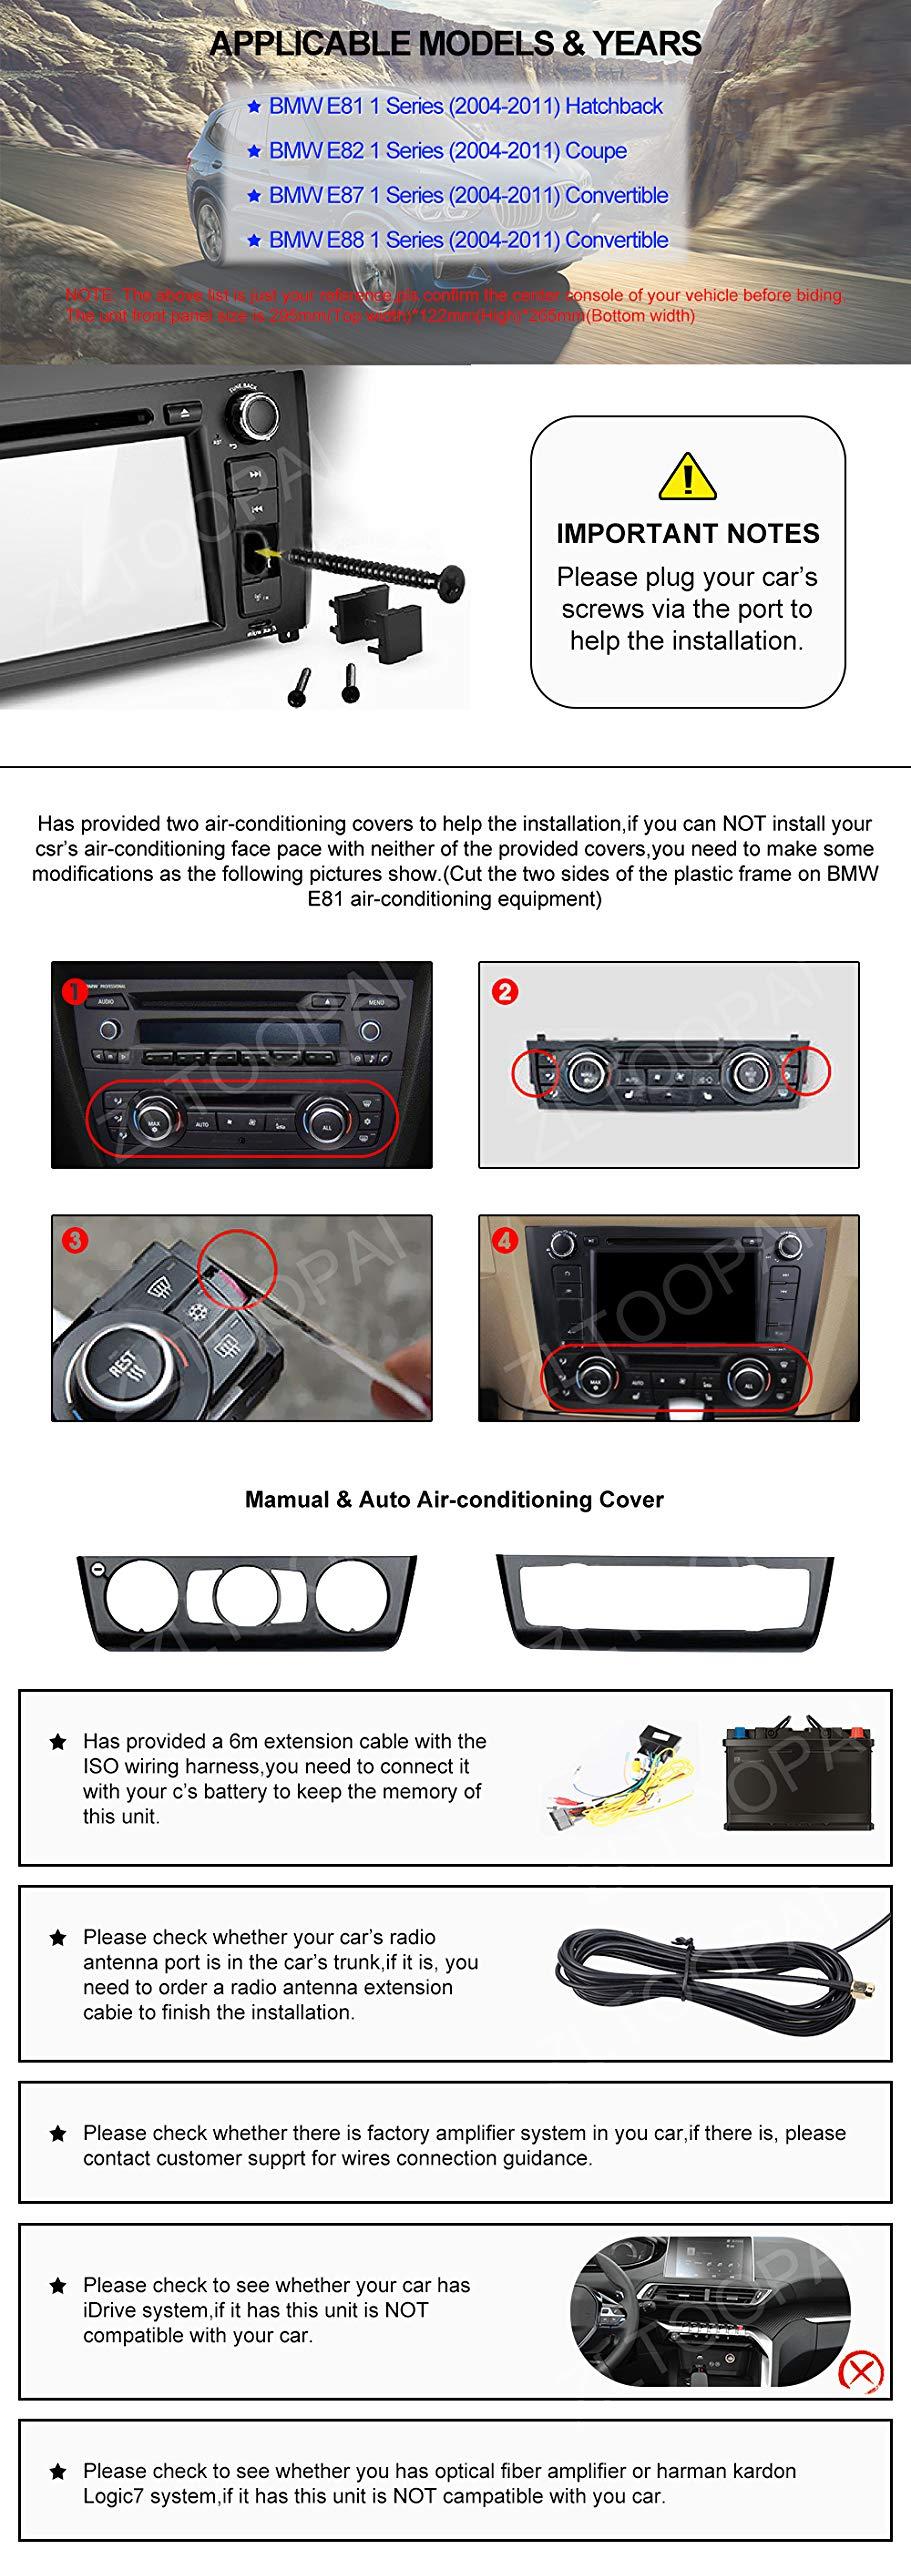 Android-Auto-Radio-Stereo-ZLTOOPAI-fr-BMW-E81-E82-E87-E88-1-Serie-Android-90-Octa-Core-4G-RAM-64G-ROM-7-Zoll-HD-Multi-Touchscreen-Auto-Stereo-GPS-Radio-DVD-Player-mit-Rckfahrkamera